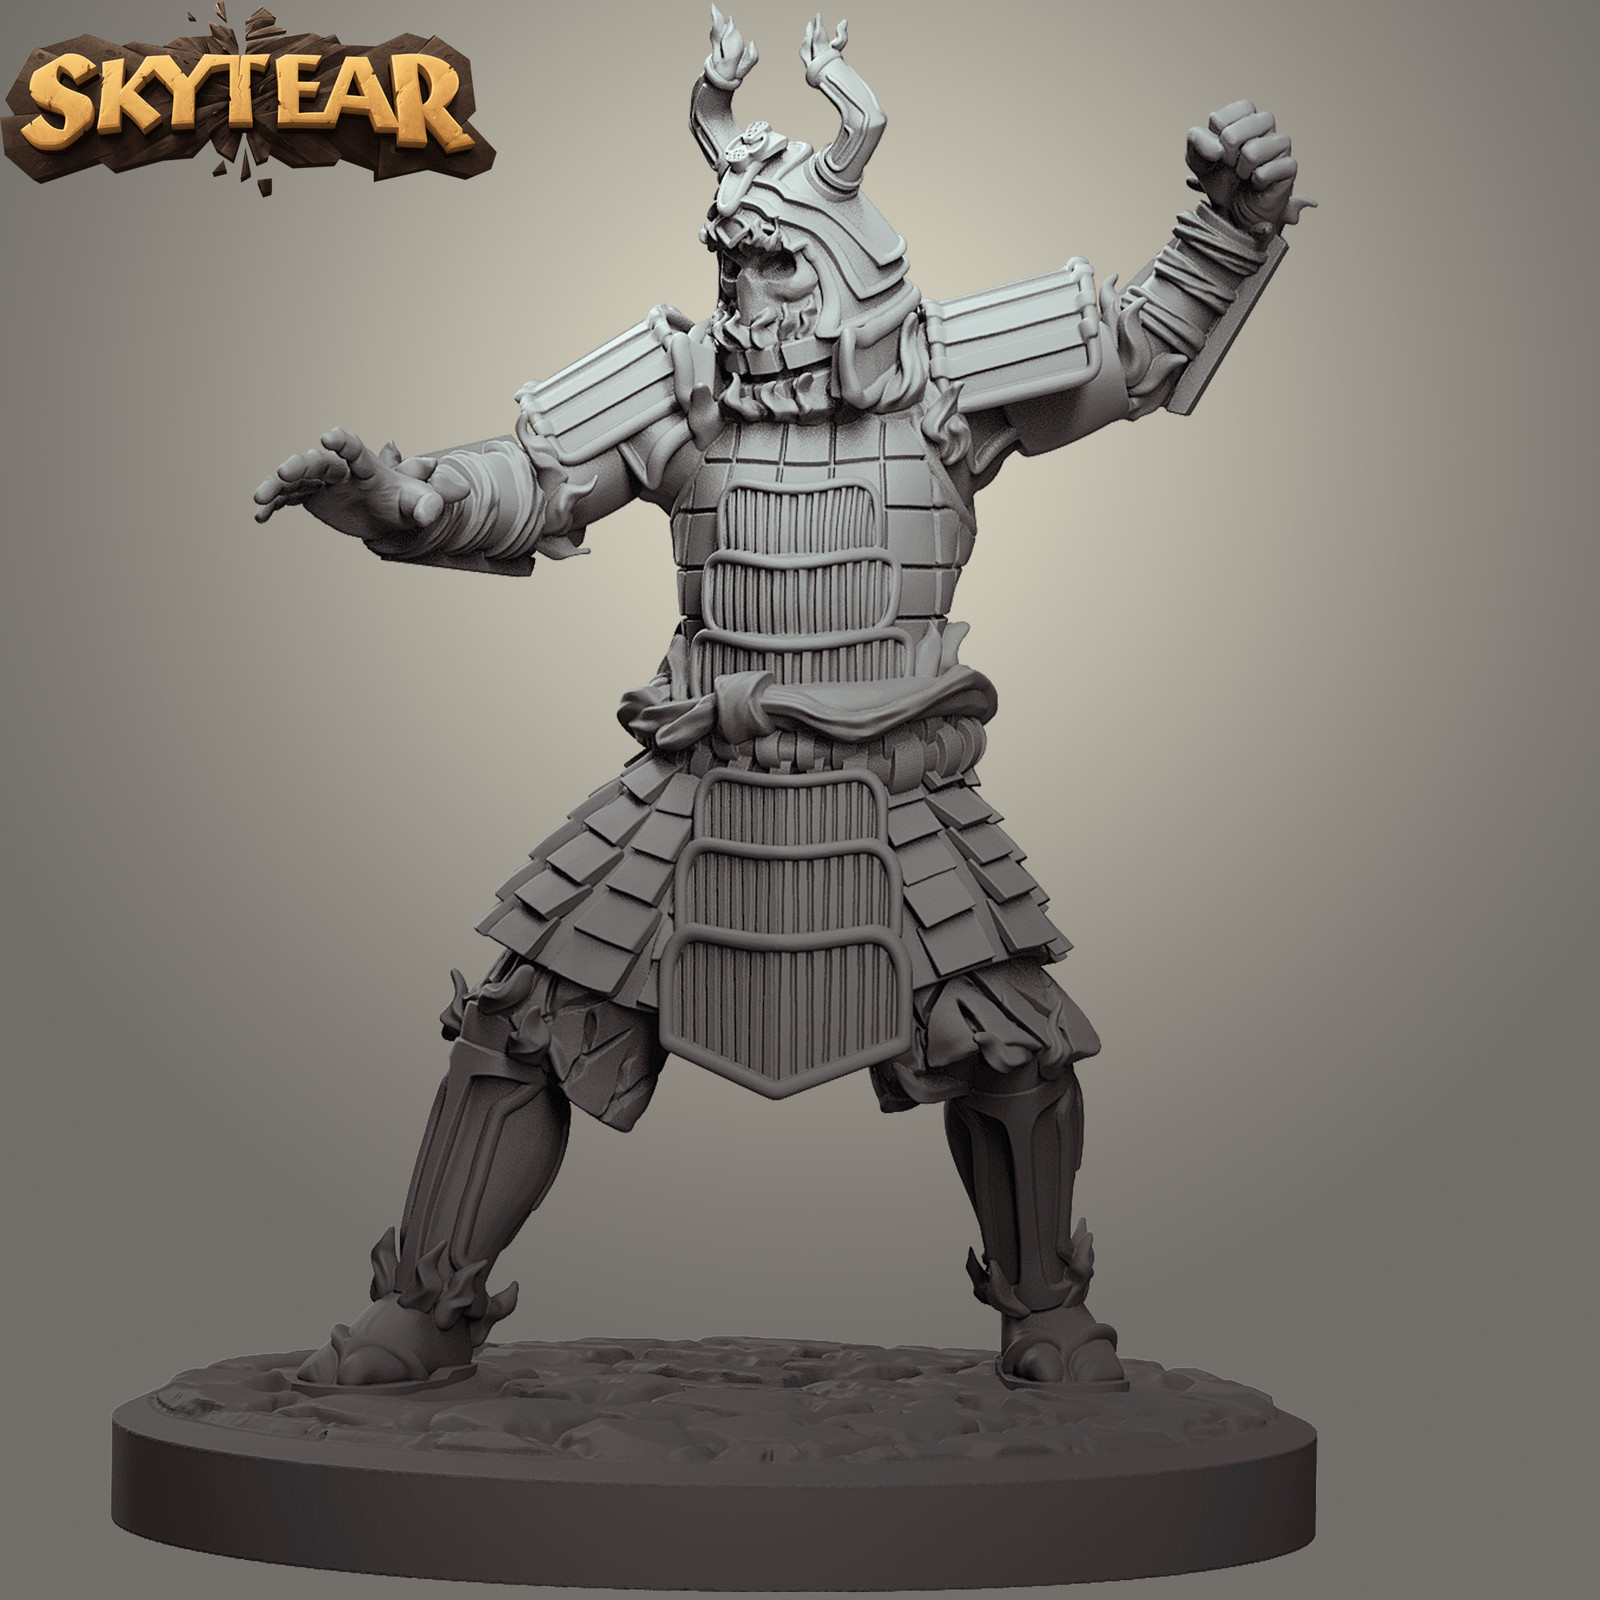 Skytear boardgame miniatures - Hogosai